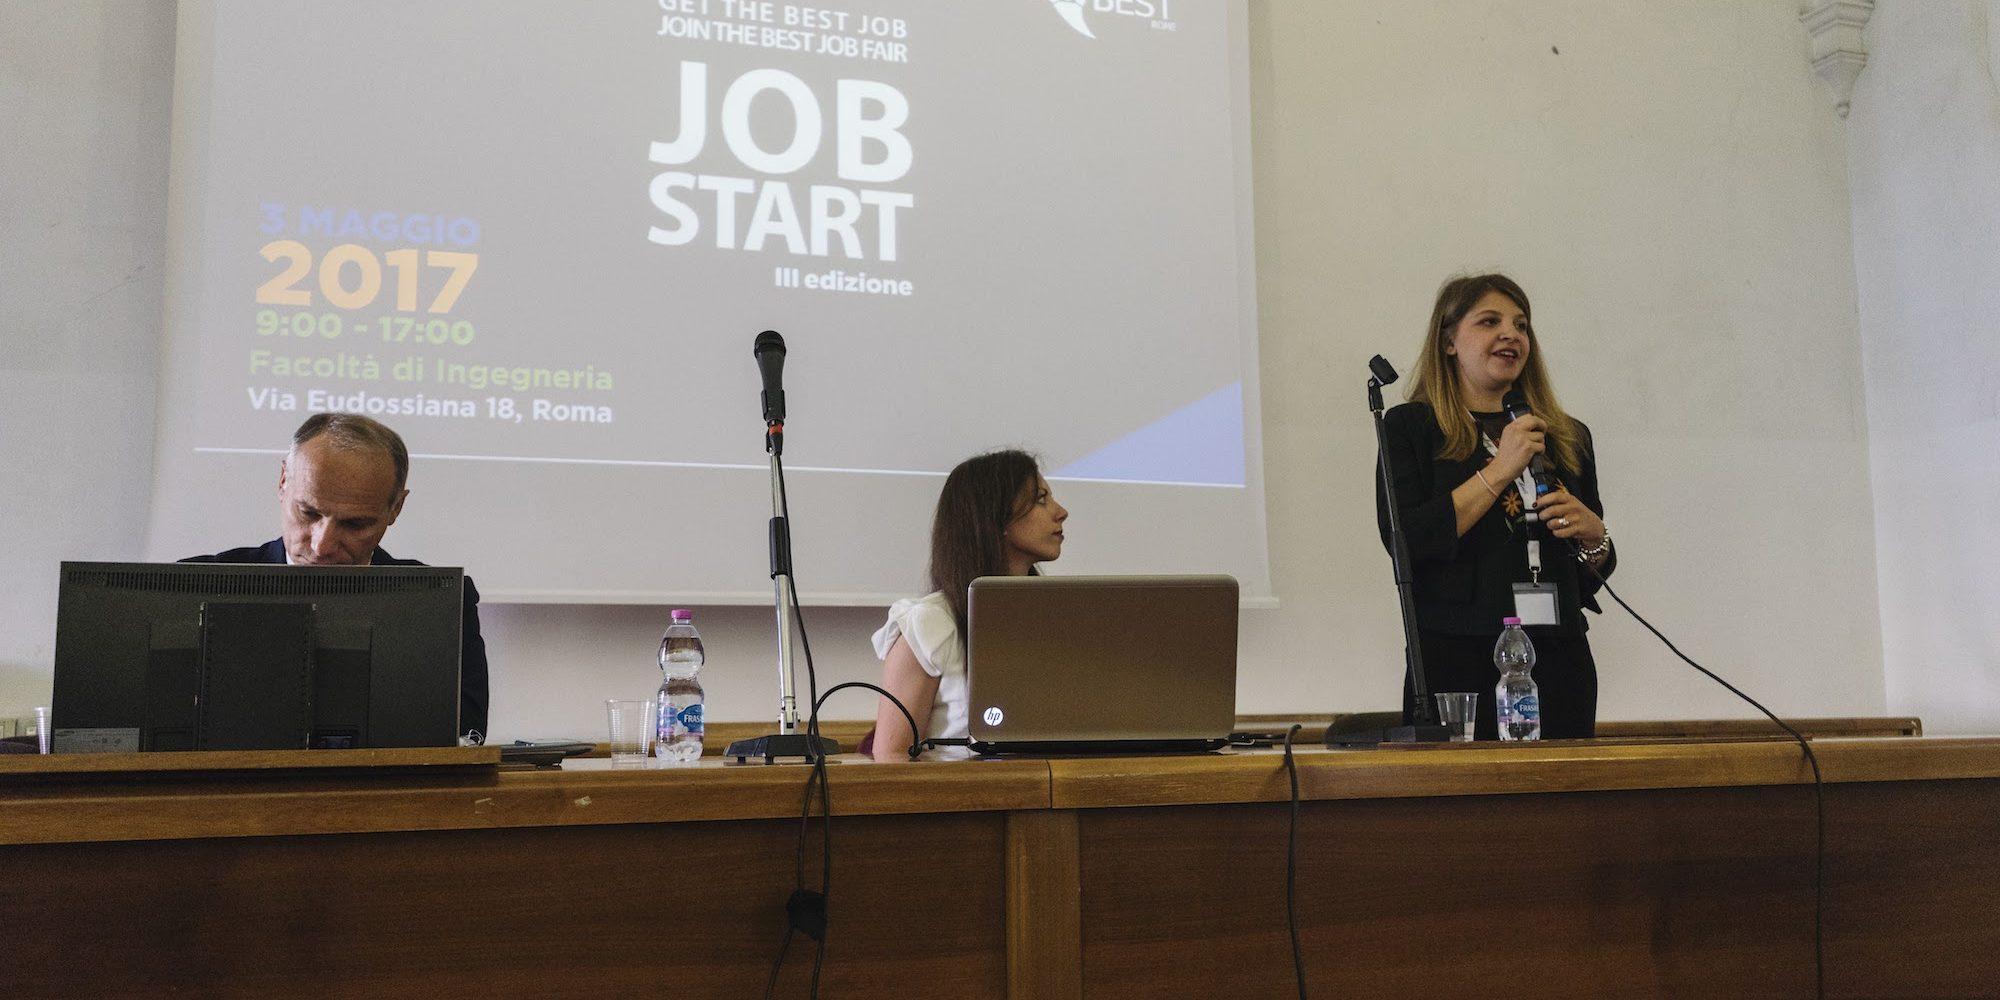 JobStart – Join the BEST Job Fair